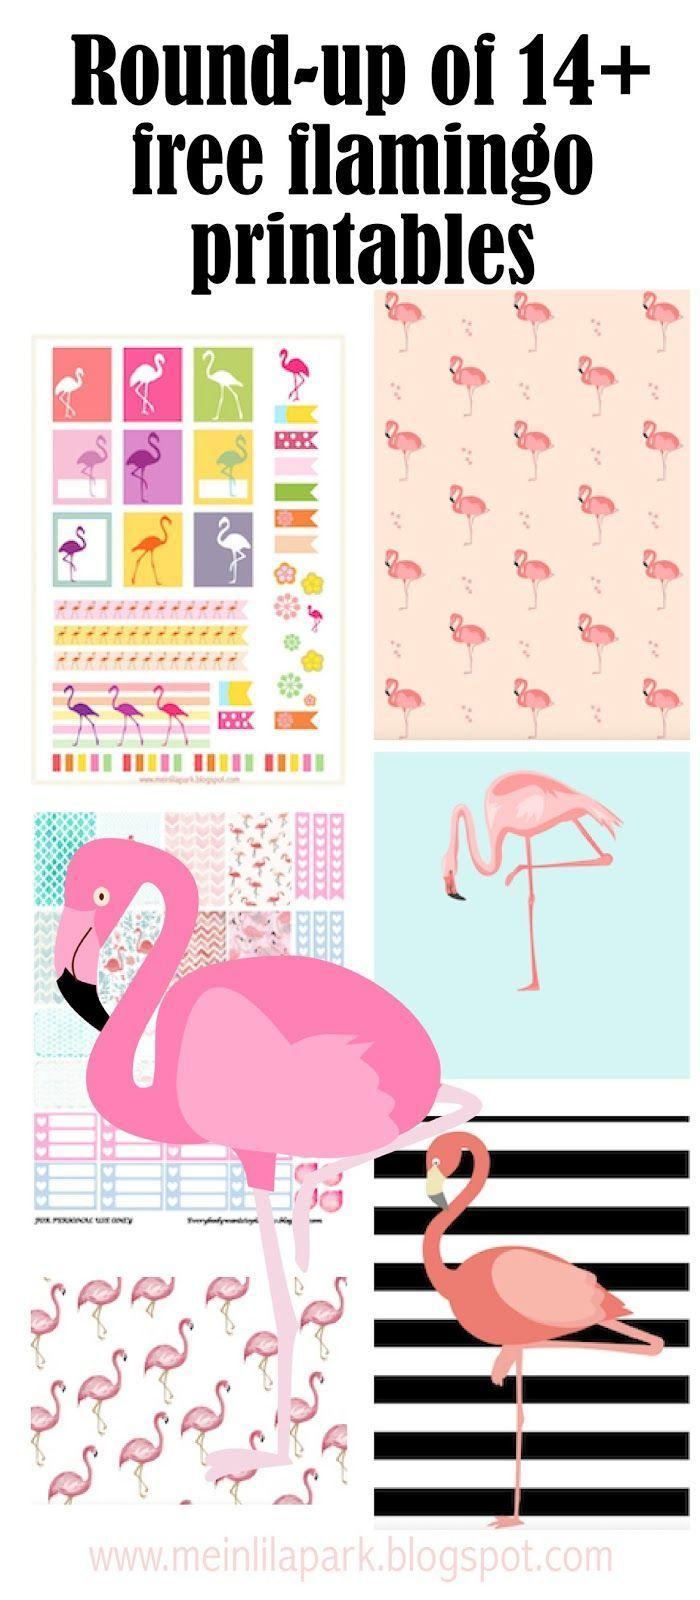 Free Flamingo Printables Flamingos Round Up Flamingo Printables Free Printable Planner Stickers Printable Planner Stickers